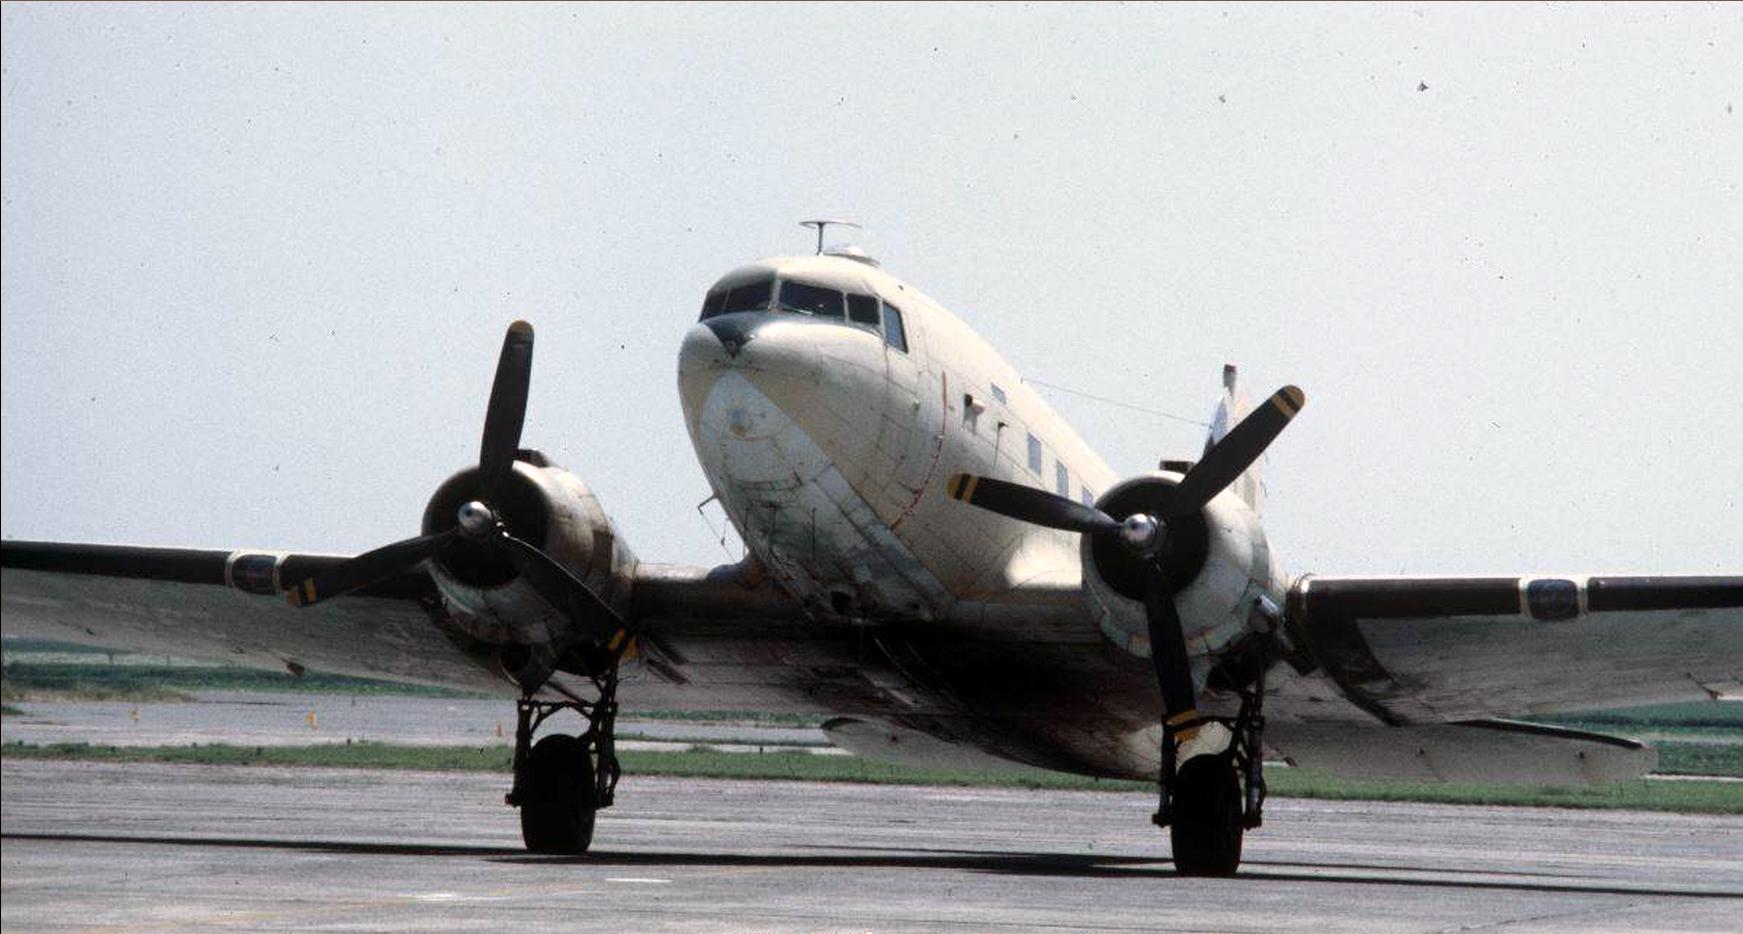 FRA: Photos anciens avions des FRA - Page 13 49759688762_7410db6f37_o_d